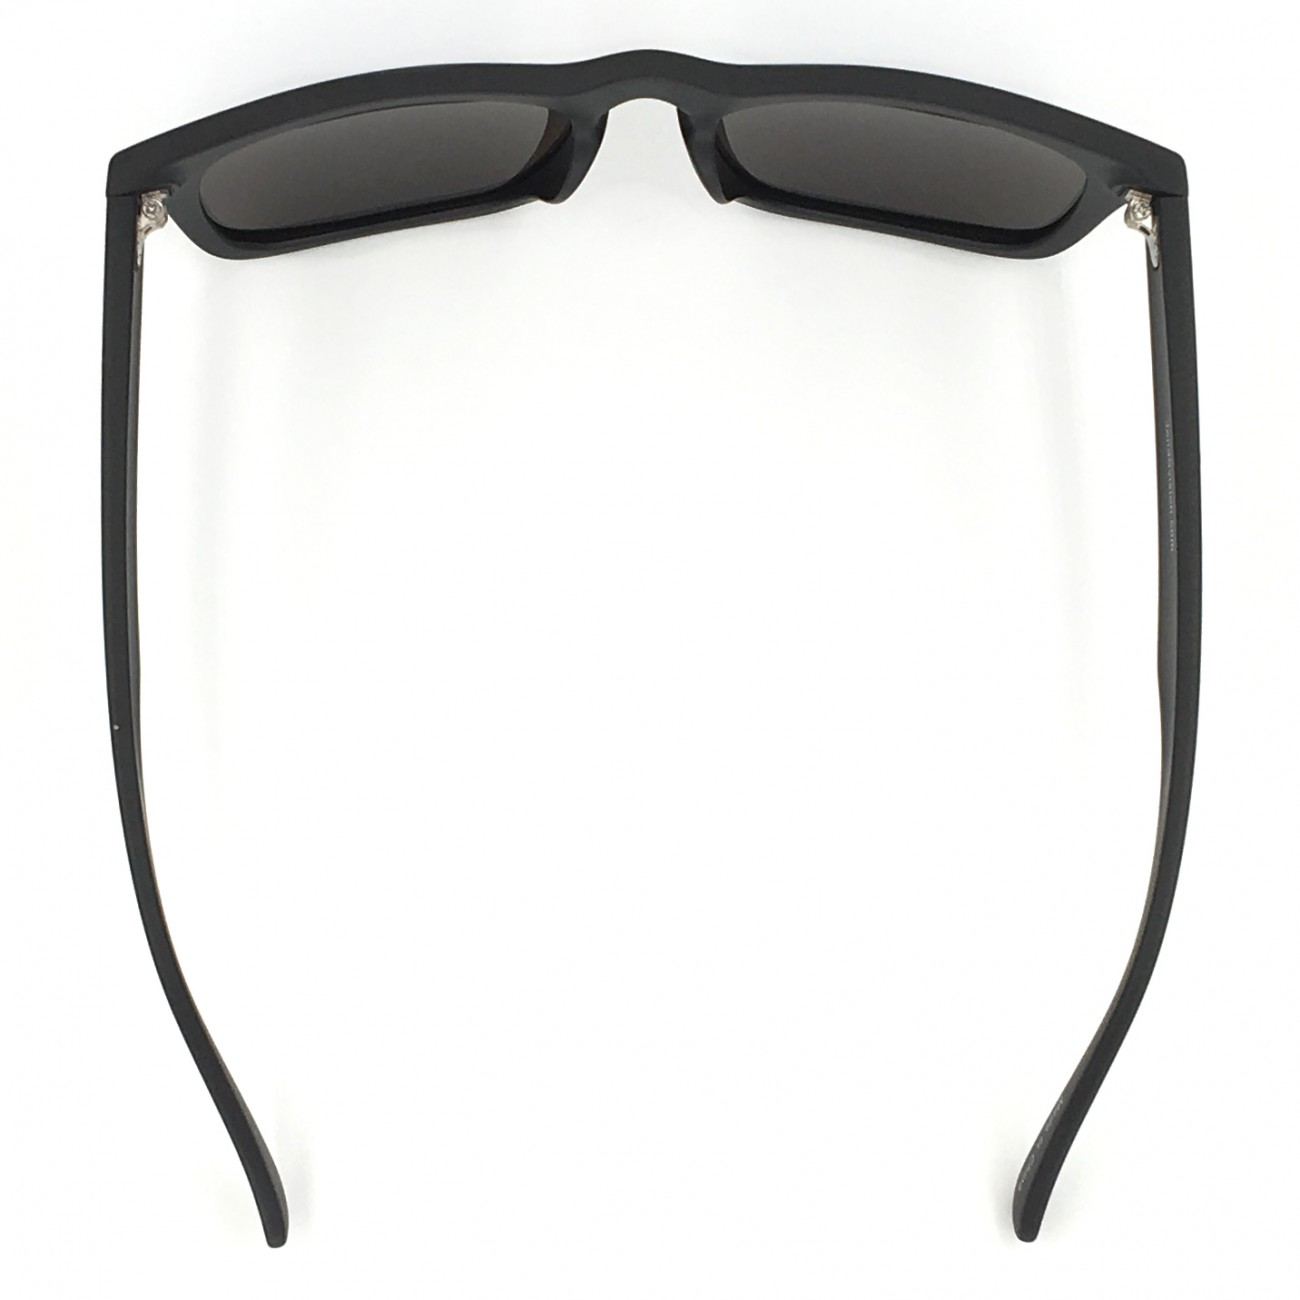 597641607a Surf Sunglasses Amazon - Restaurant and Palinka Bar